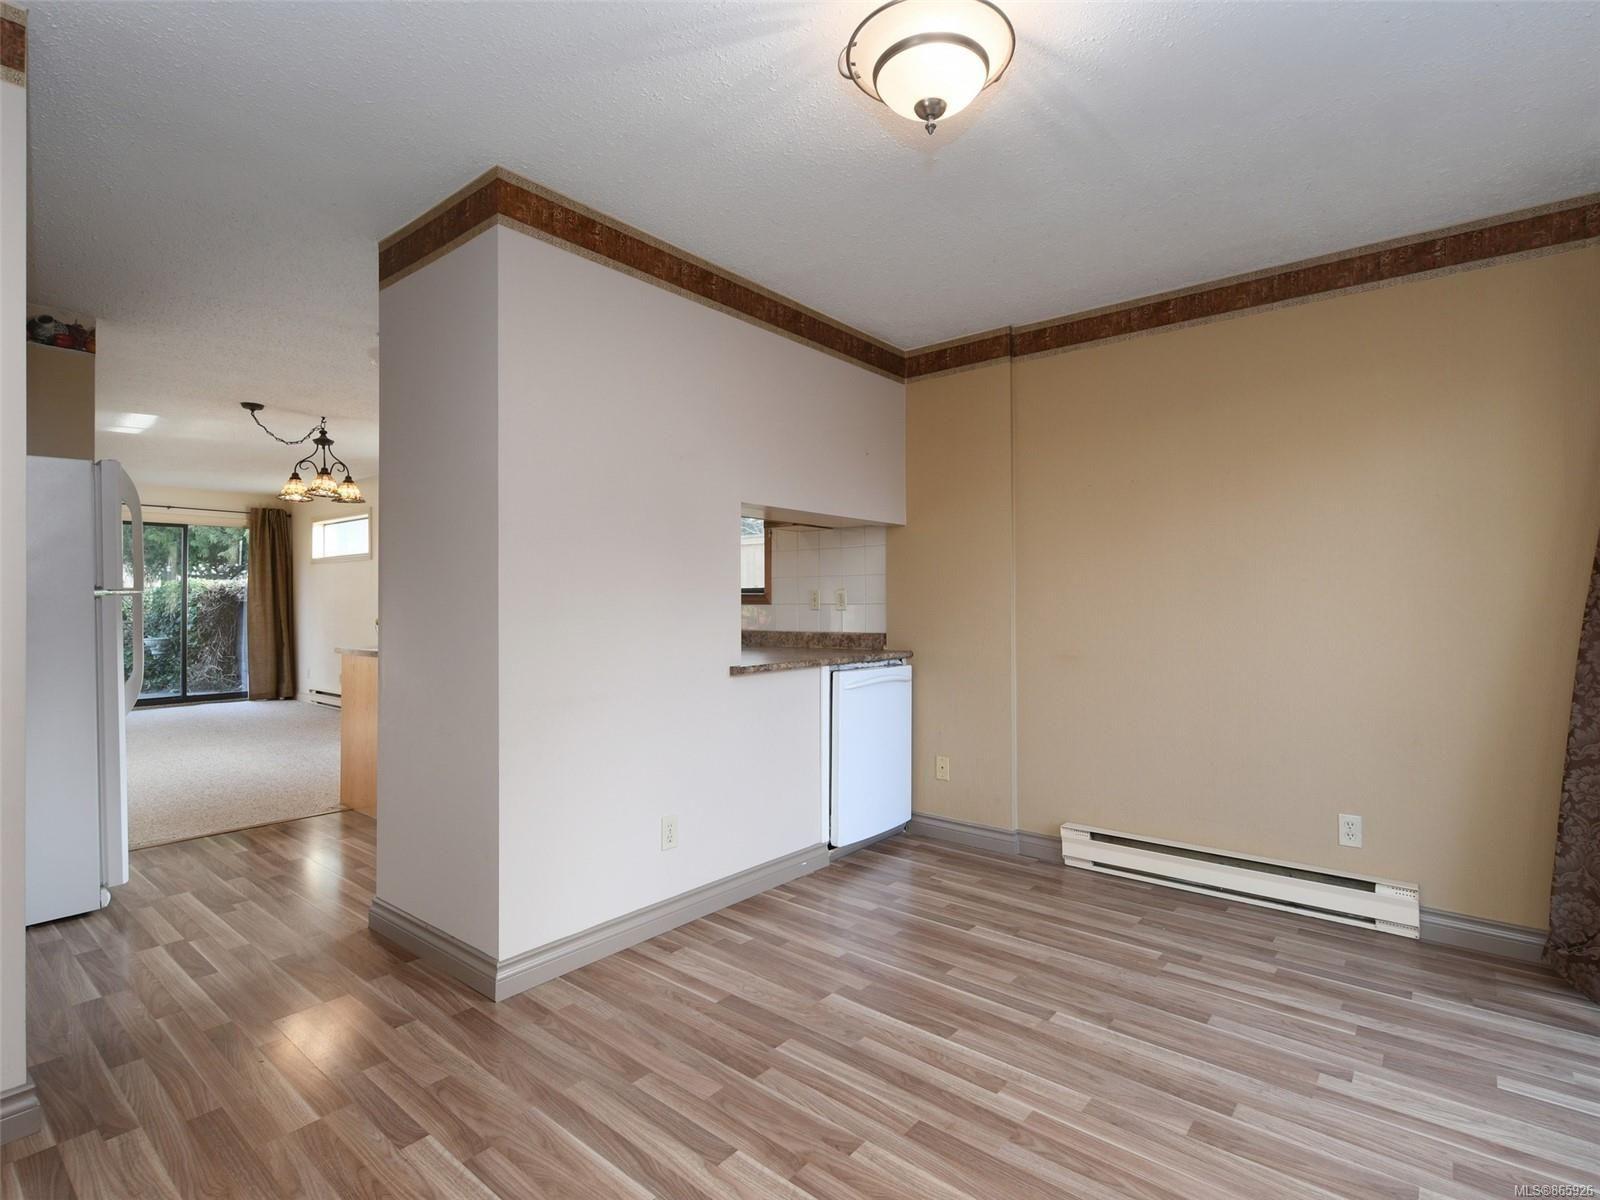 Photo 10: Photos: 8 4350 West Saanich Rd in : SW Royal Oak Row/Townhouse for sale (Saanich West)  : MLS®# 865926